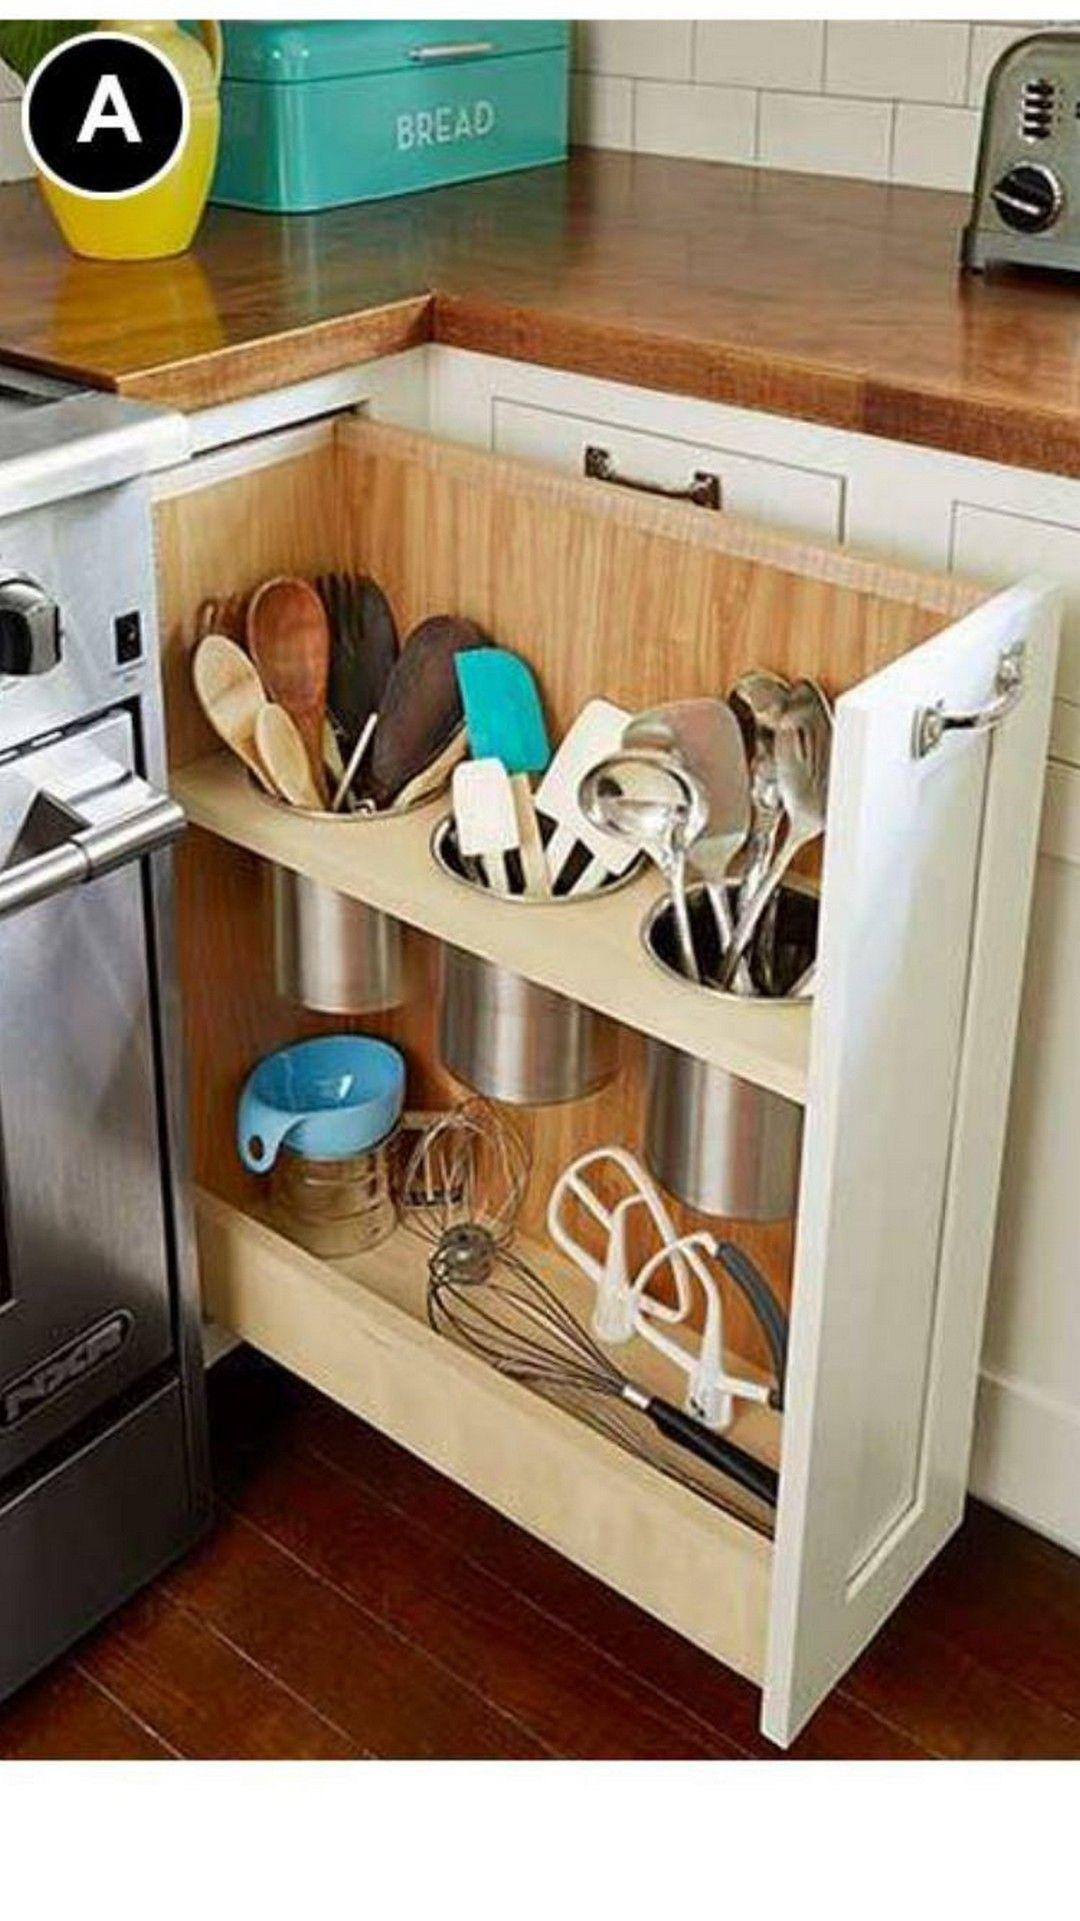 26 most innovatively smart kitchen interior designs https www kitchenholic org